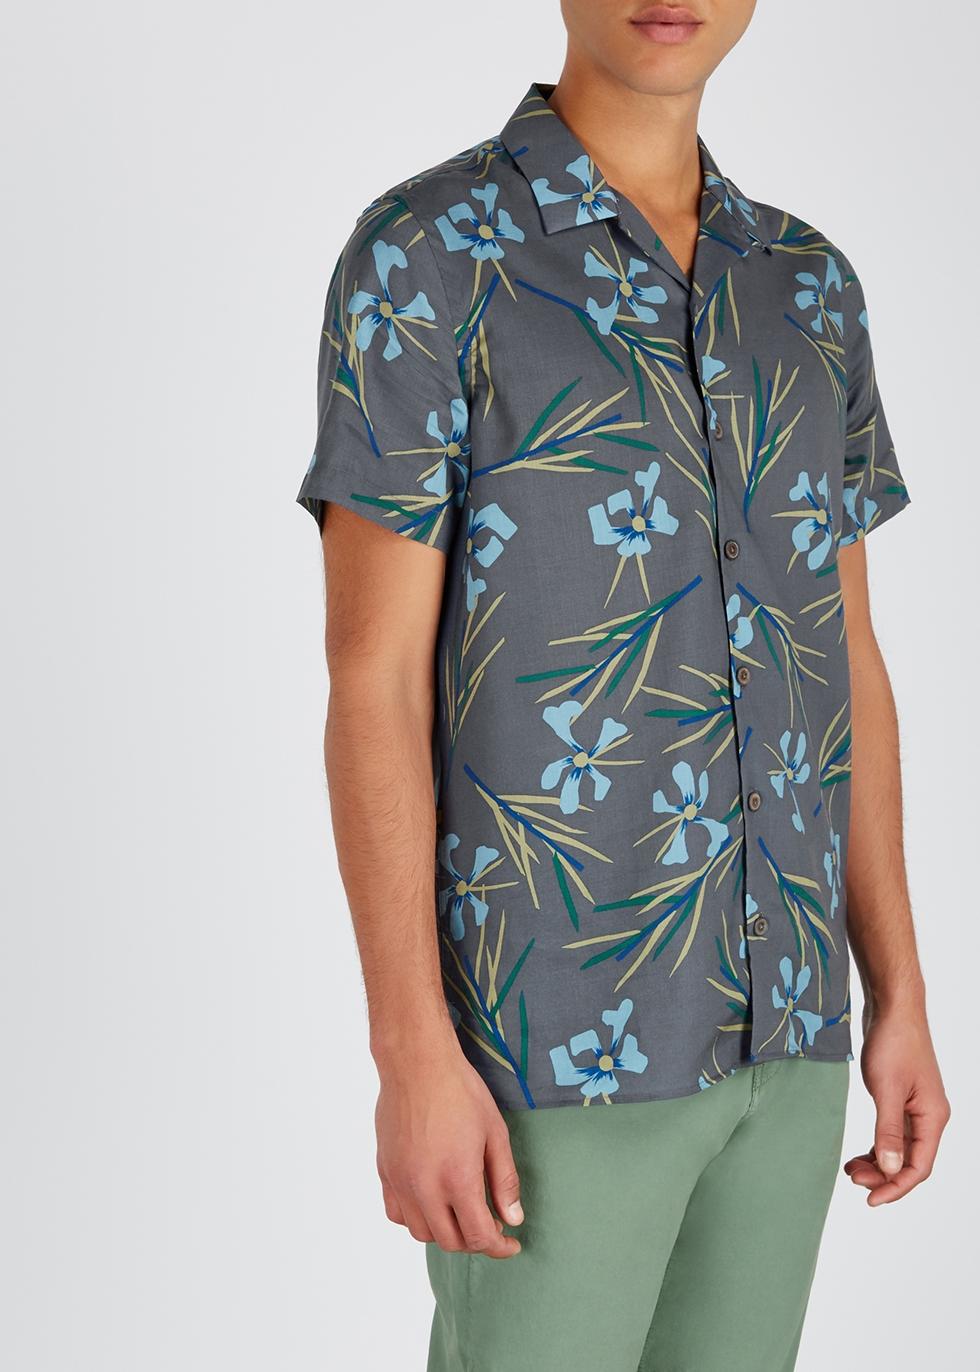 Grey floral-print Lyocell shirt - Paul Smith